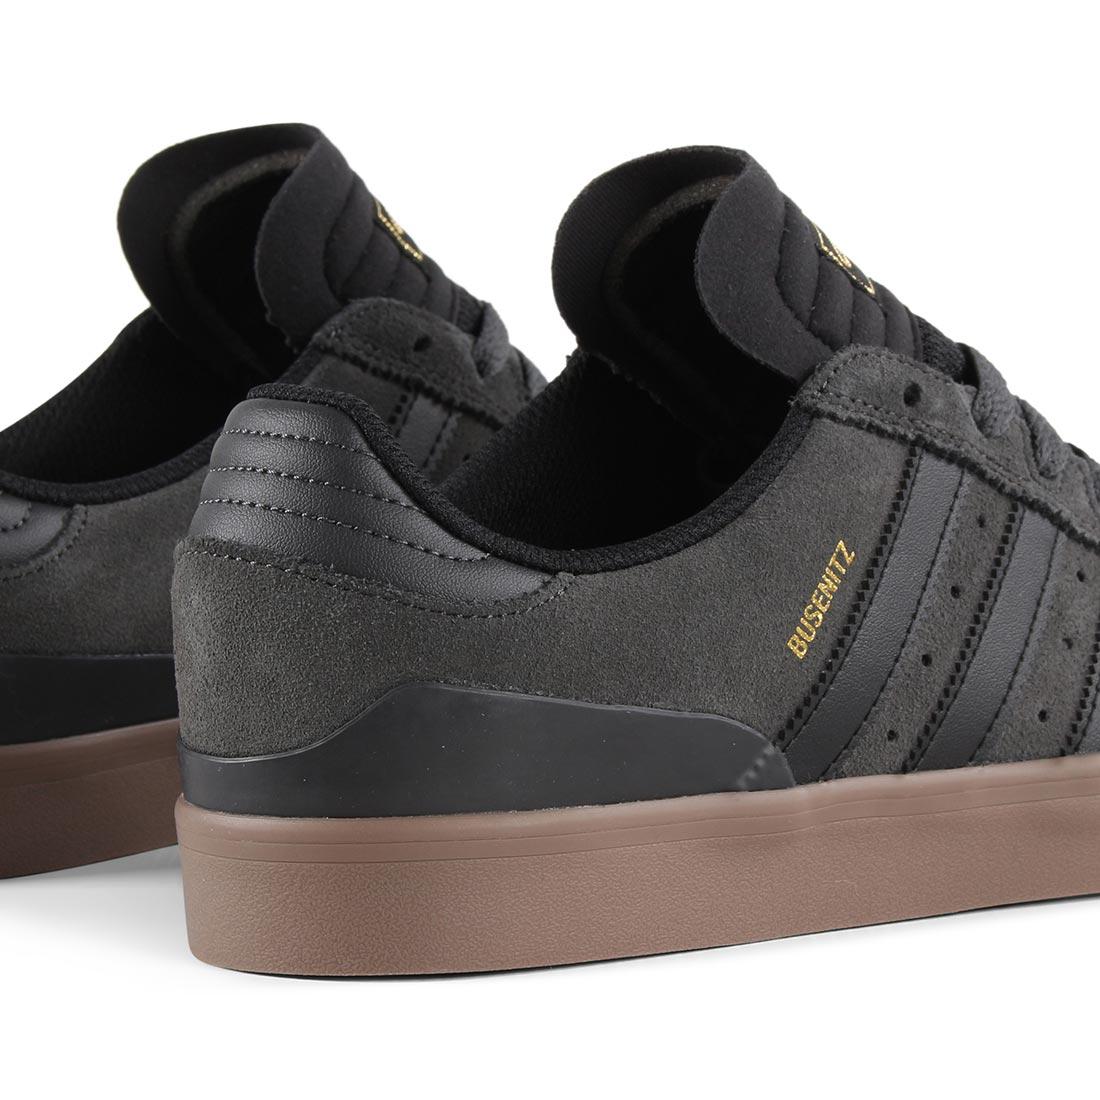 big sale 50801 37fab ... Adidas-Busenitz-Vulc-Shoes-DGH-Solid-Grey-Core ...